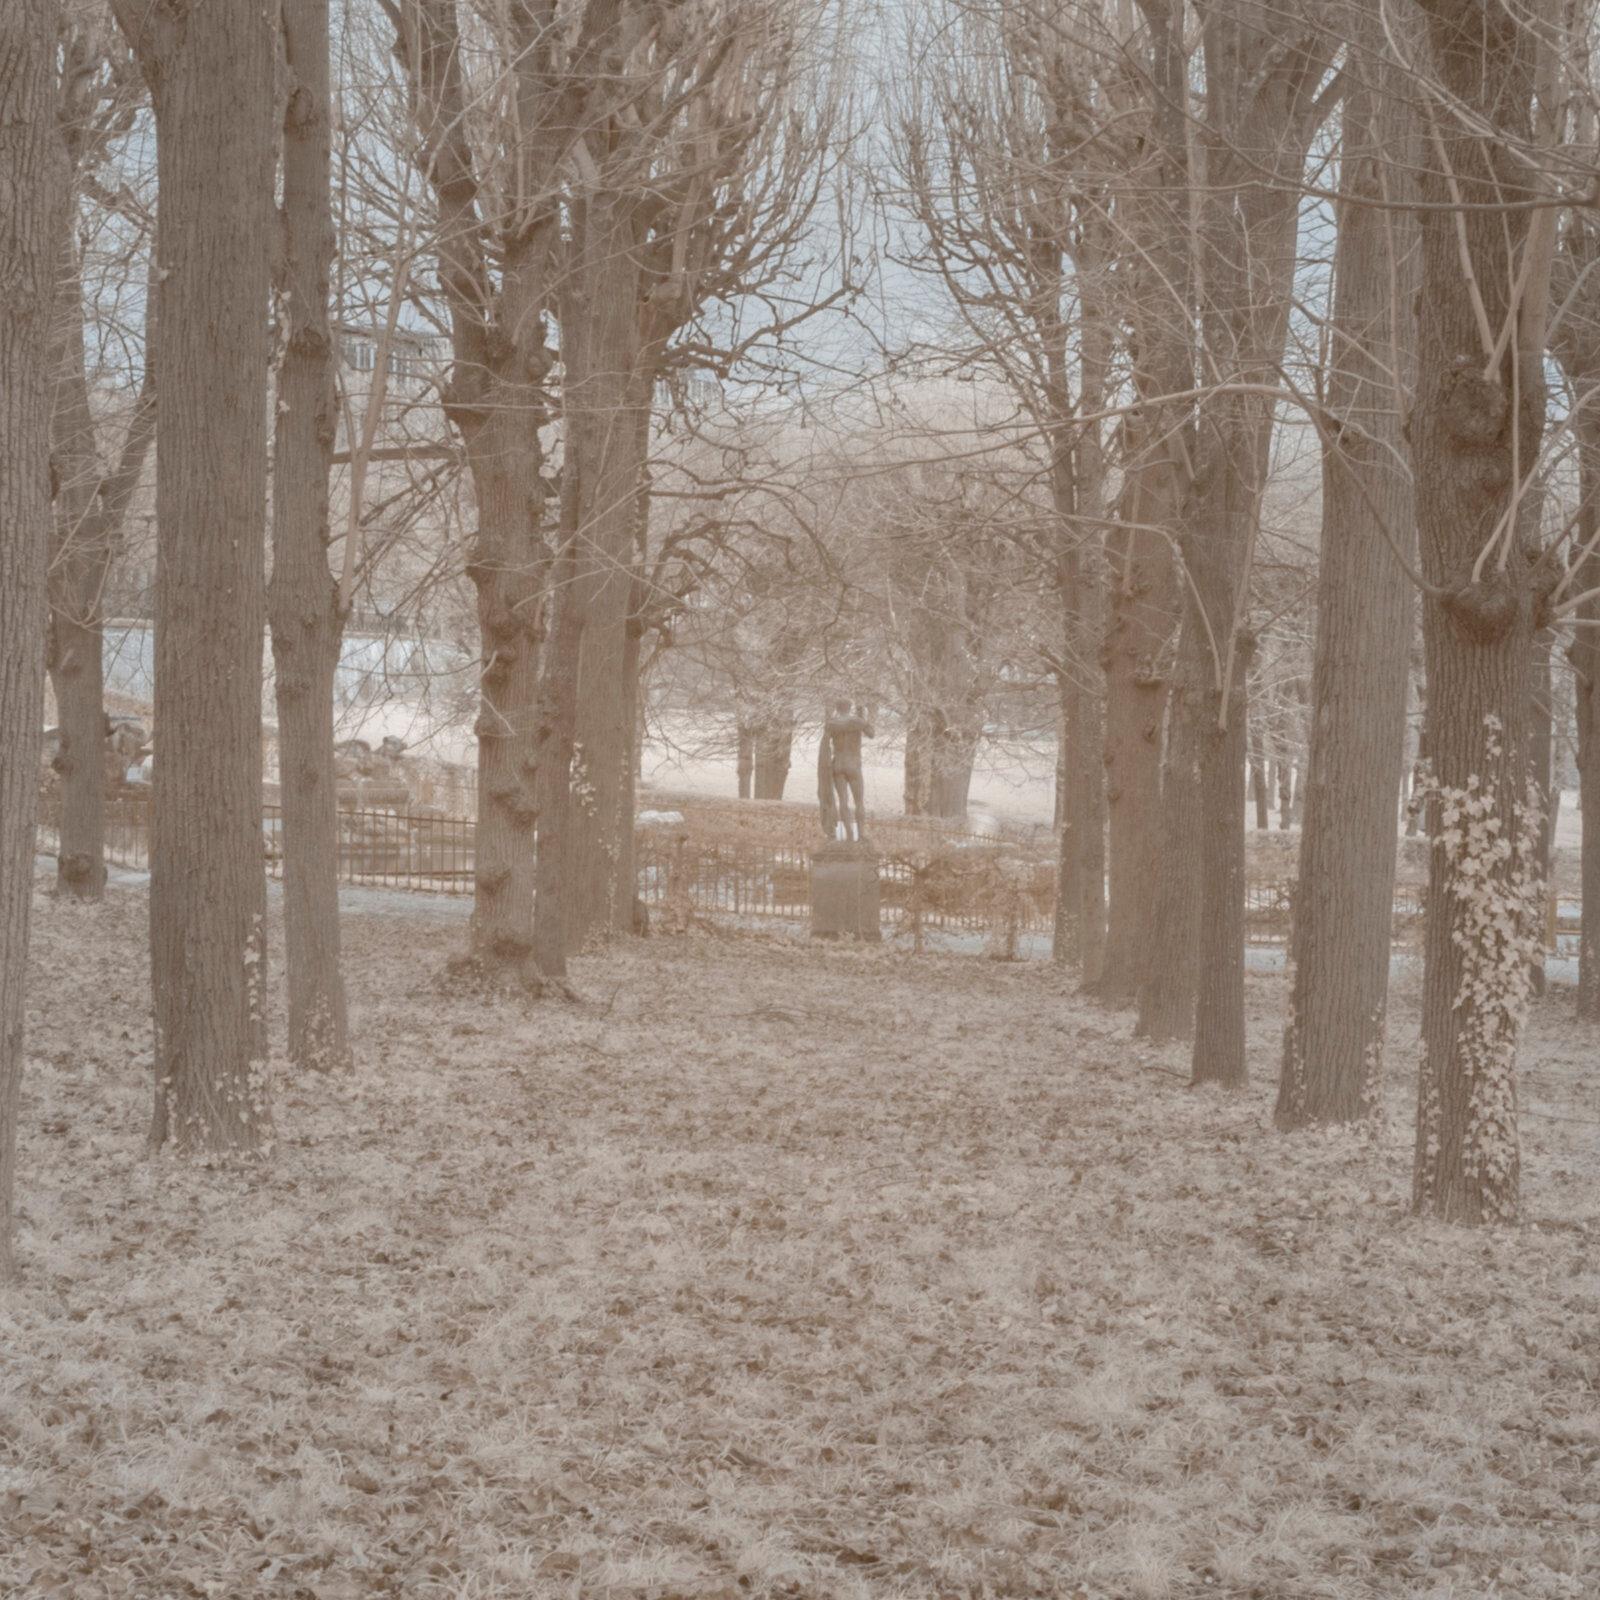 DETAILS 2 24mm F11 SIGMA 1 | Pierre-Louis Ferrer | Test du SIGMA 24mm F/1.4 DG HSM Art en photographie infrarouge | Partie 1